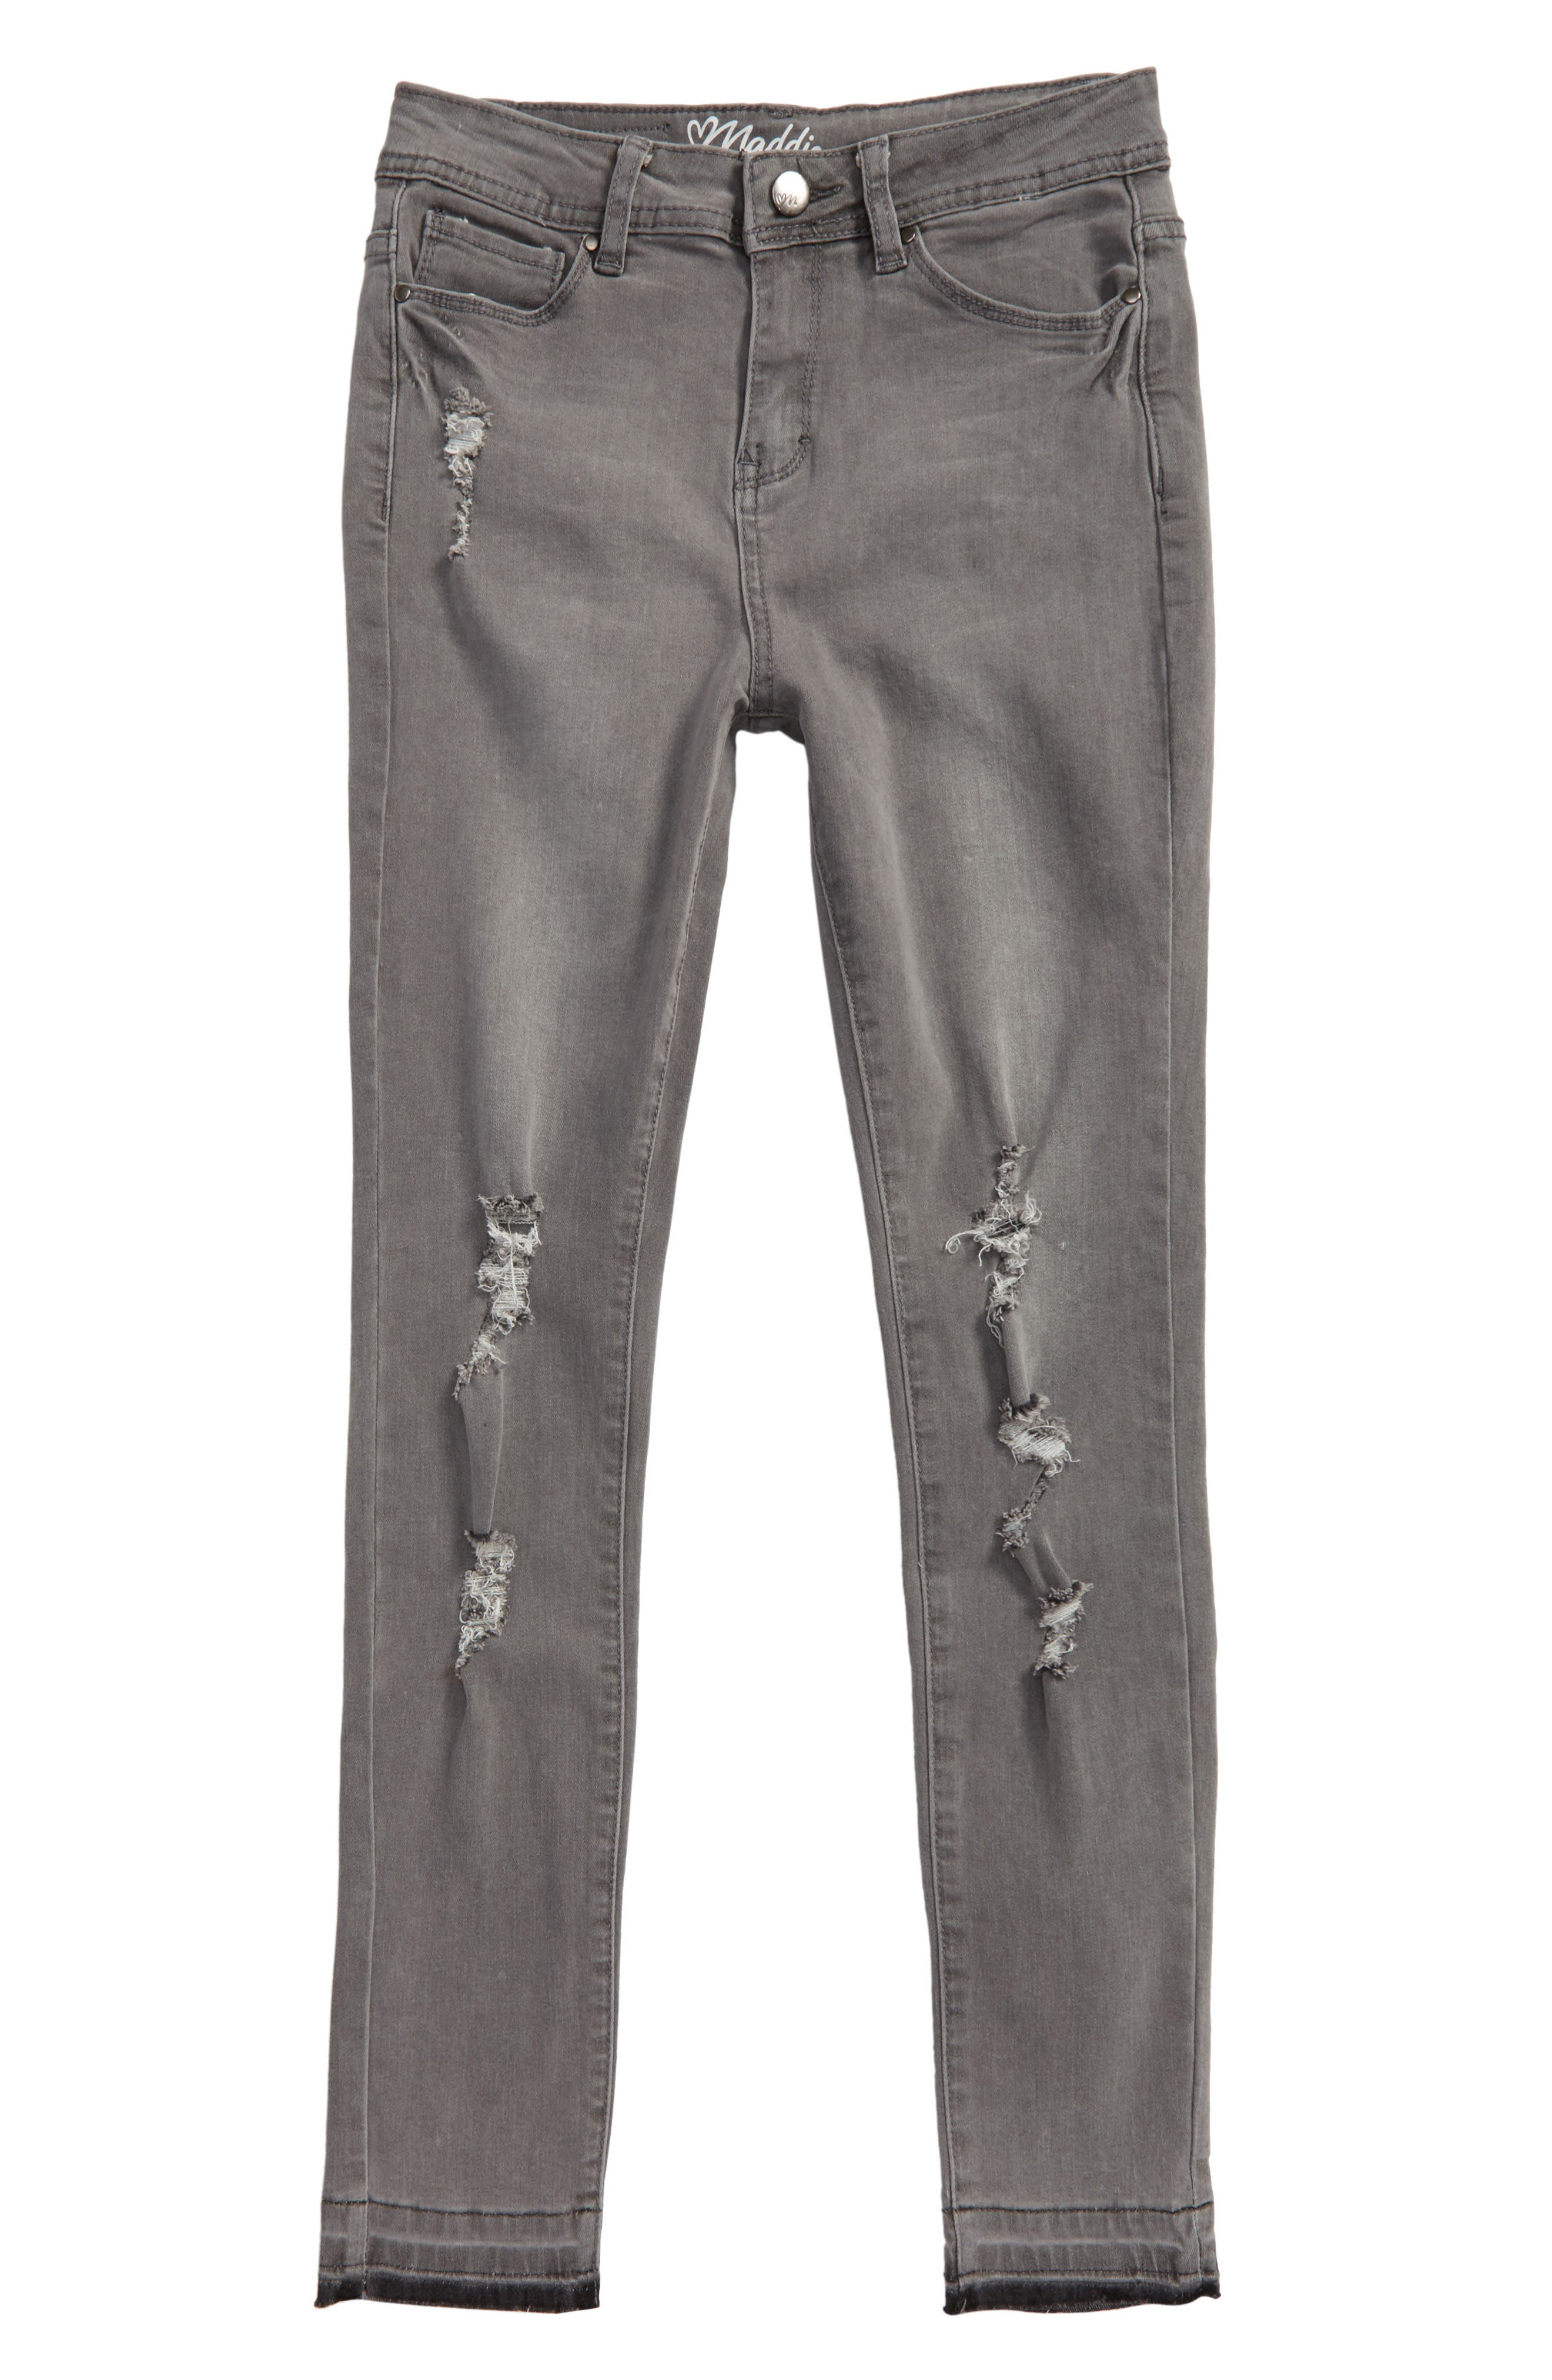 Maddie Distressed Denim Skinny Jeans (Big Girls)